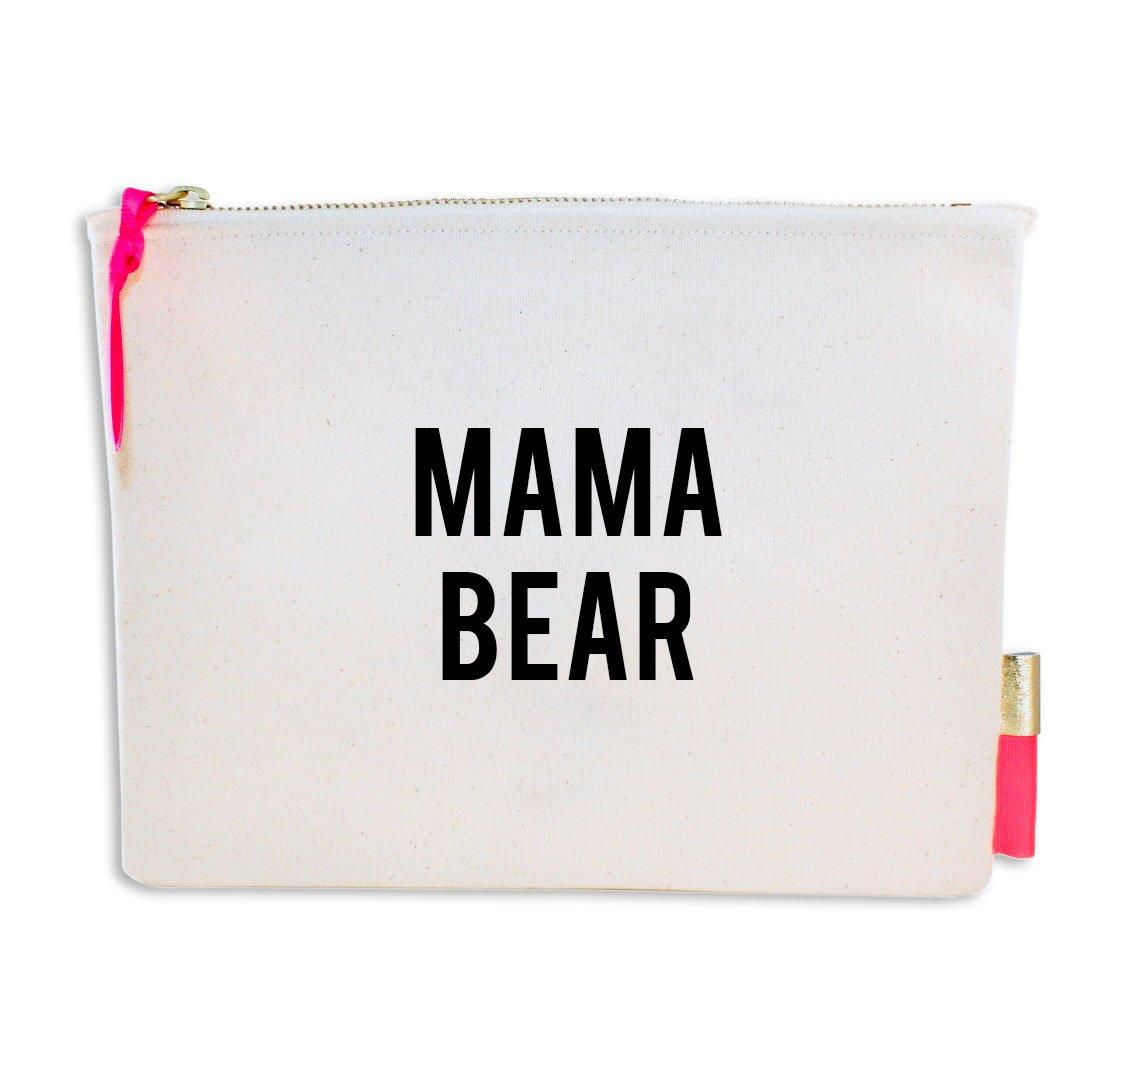 Image of PIPI CUCU CANVAS CLUTCH- MAMA BEAR